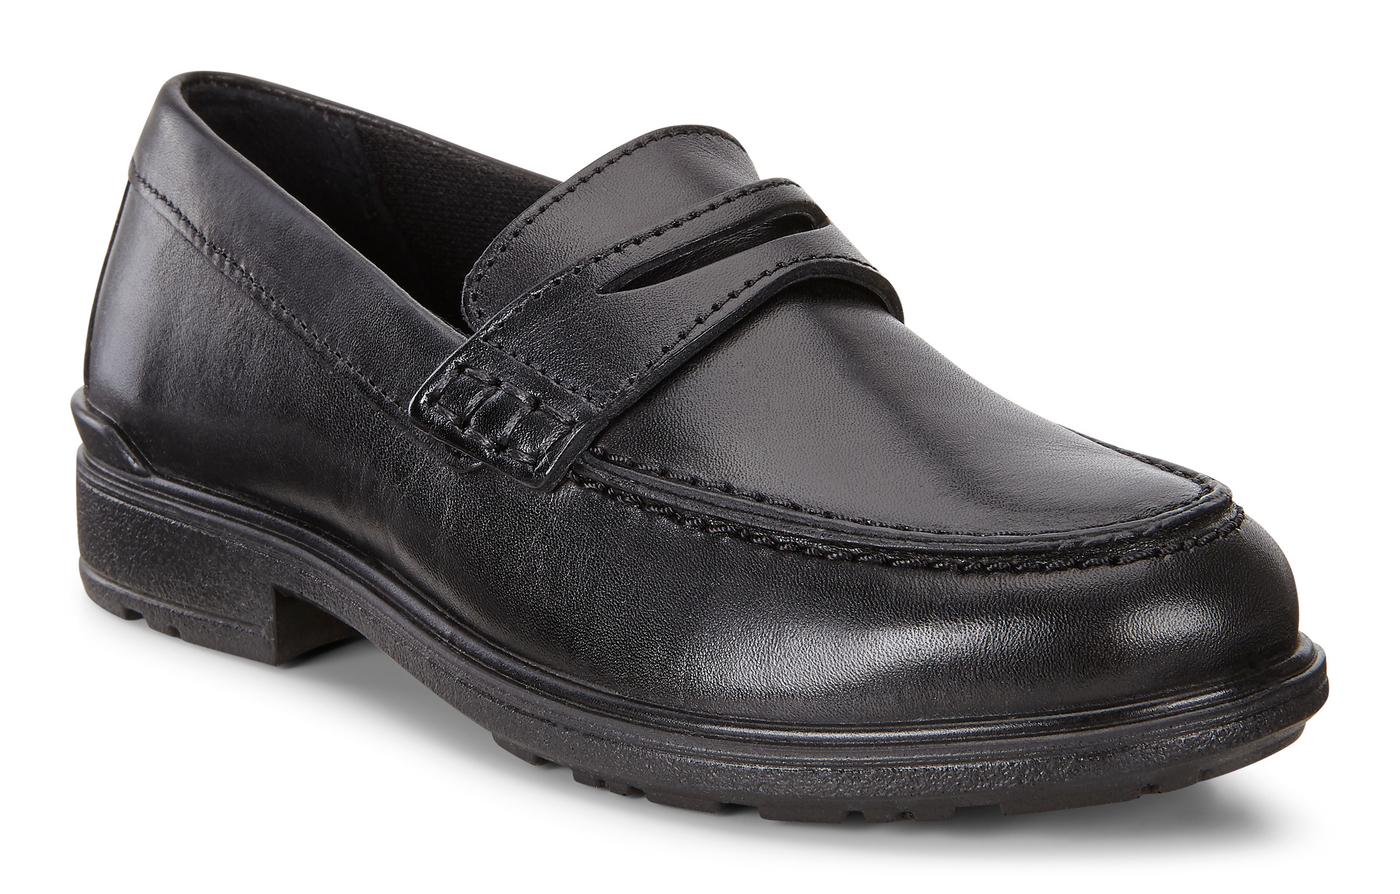 ECCO COHEN Loafer